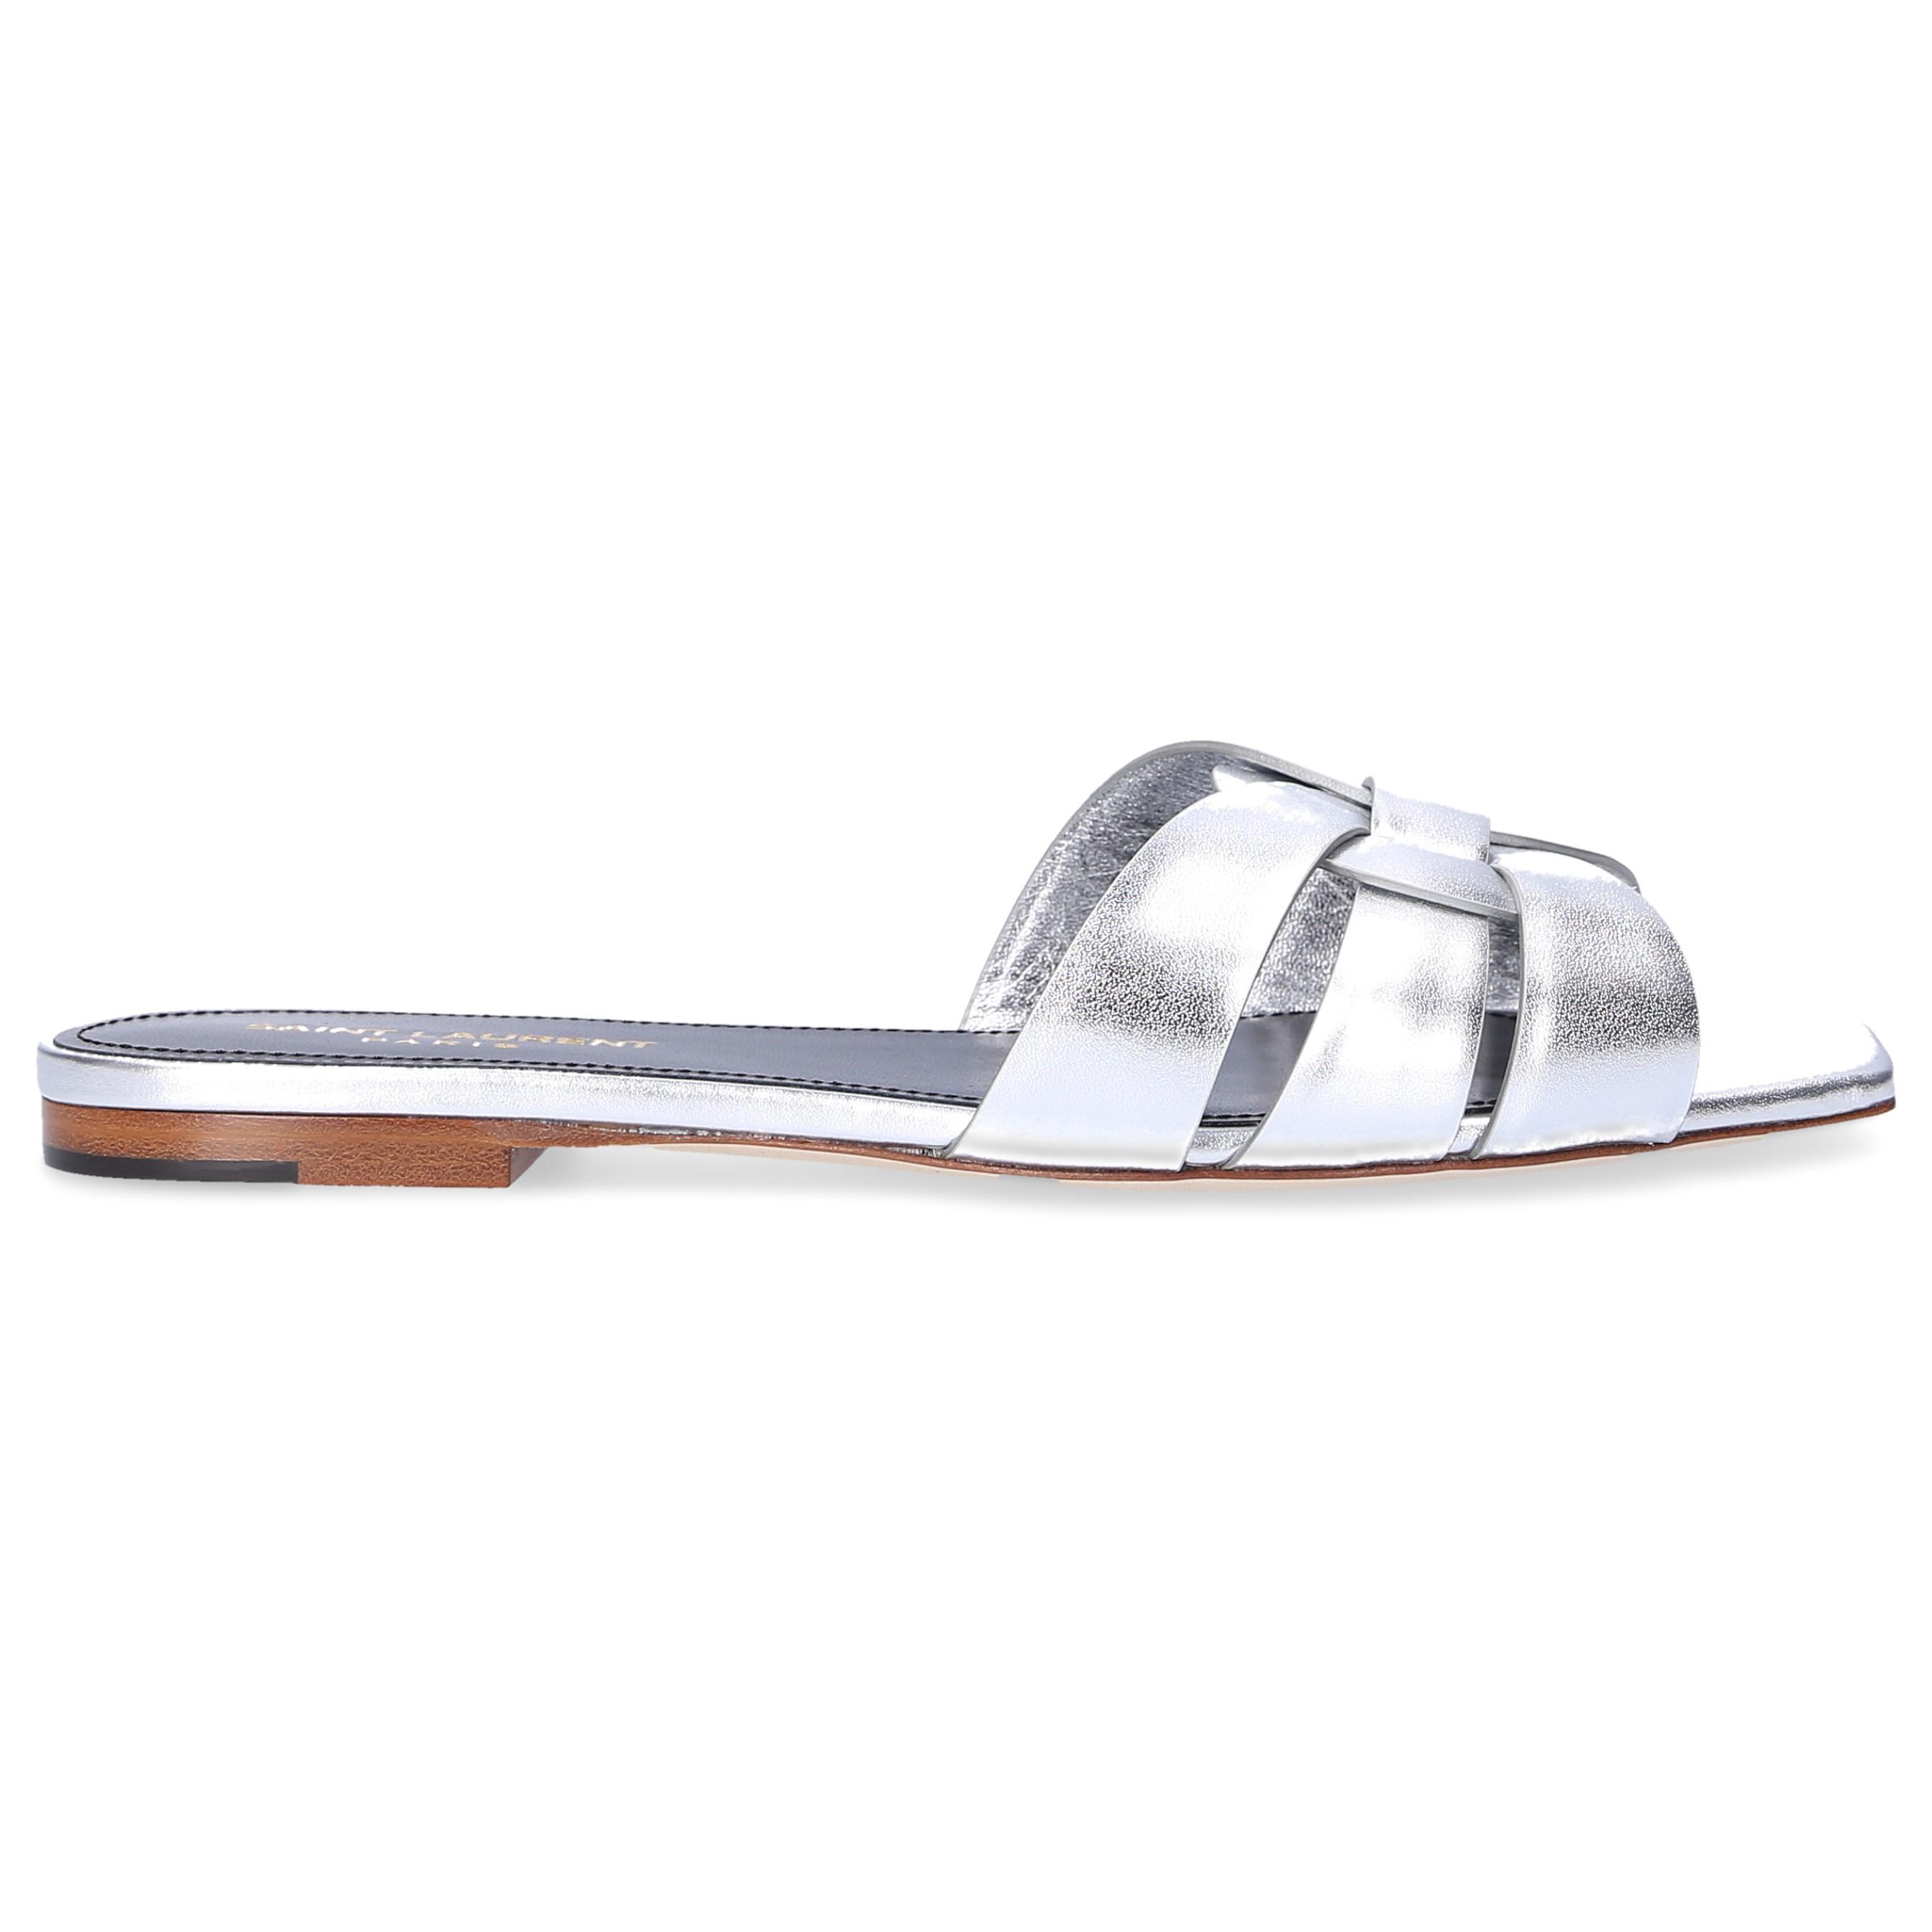 33f587645ccd Saint Laurent Sandals Pied 05 in Metallic - Lyst